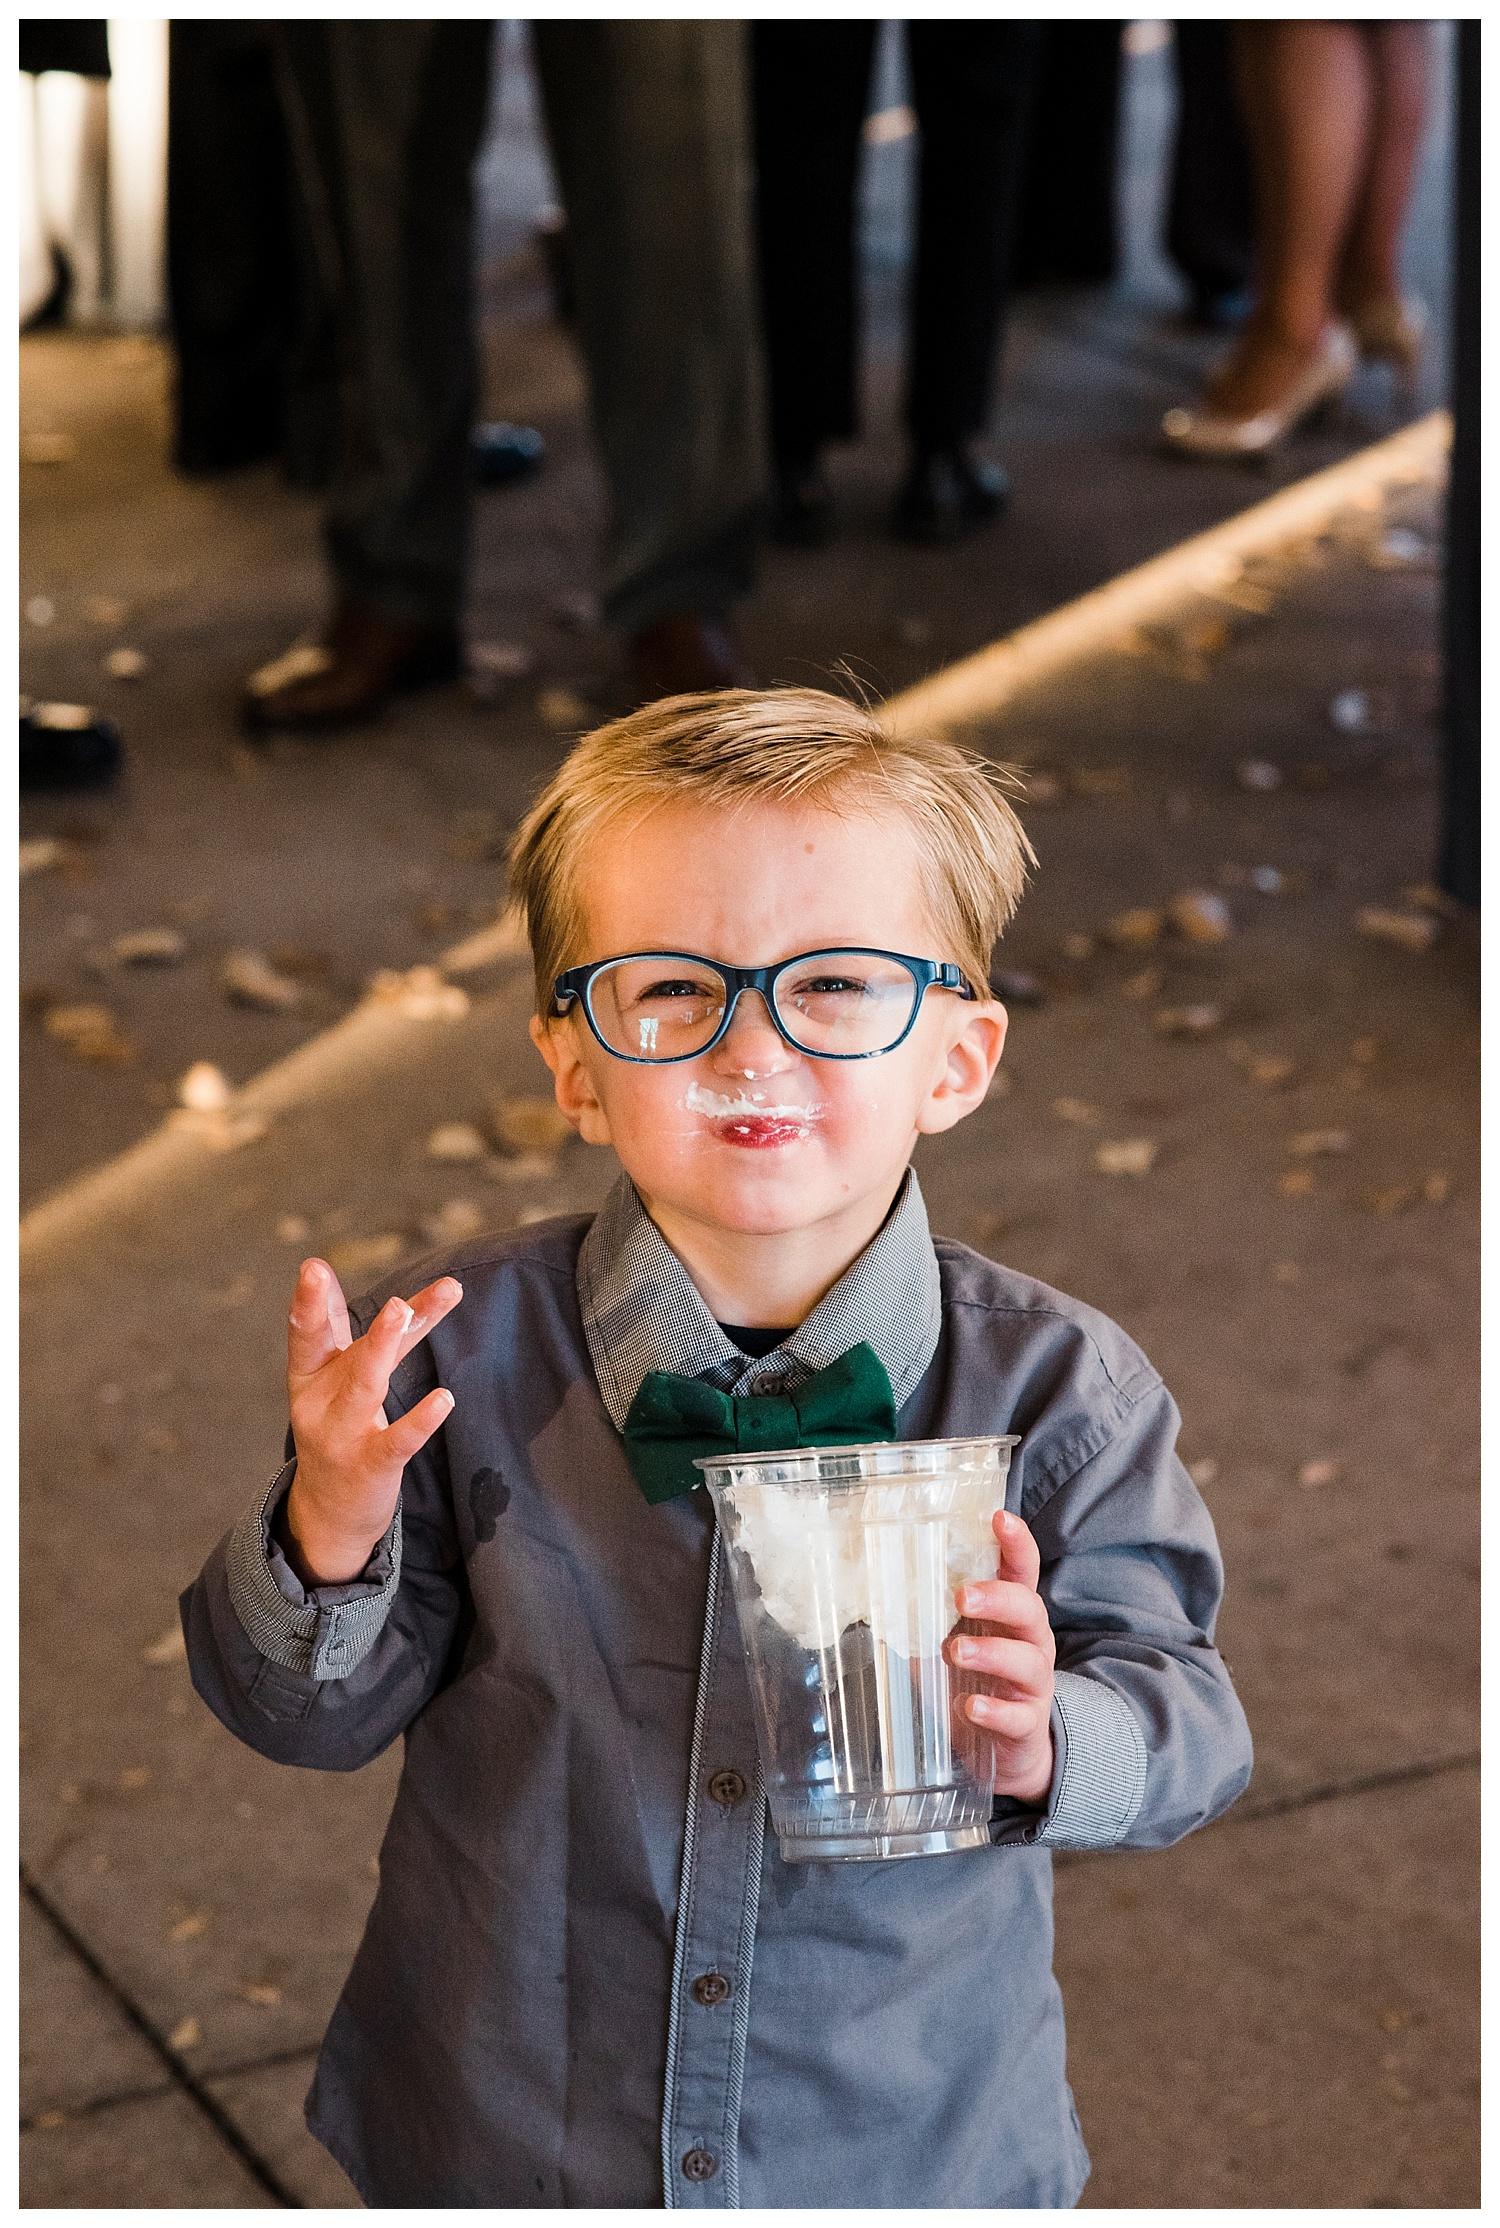 Hot_Chocolate_Bar_The_Barn_At_Raccoon_Creek_Wedding_Apollo_Fields_040.jpg